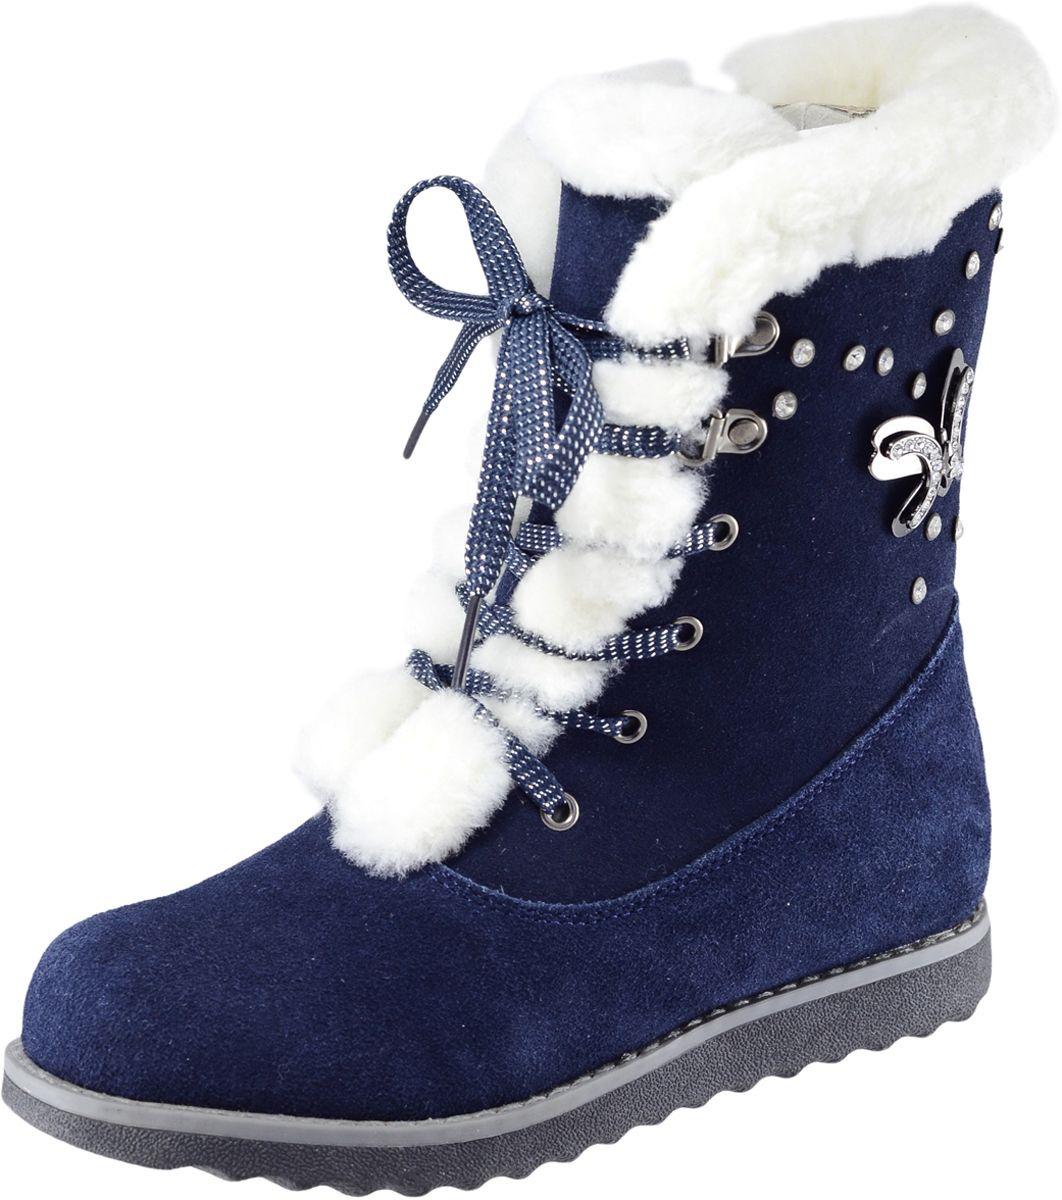 Сапоги Buddy Dog сапоги для девочки buddy dog цвет синий by8829 3 размер 28